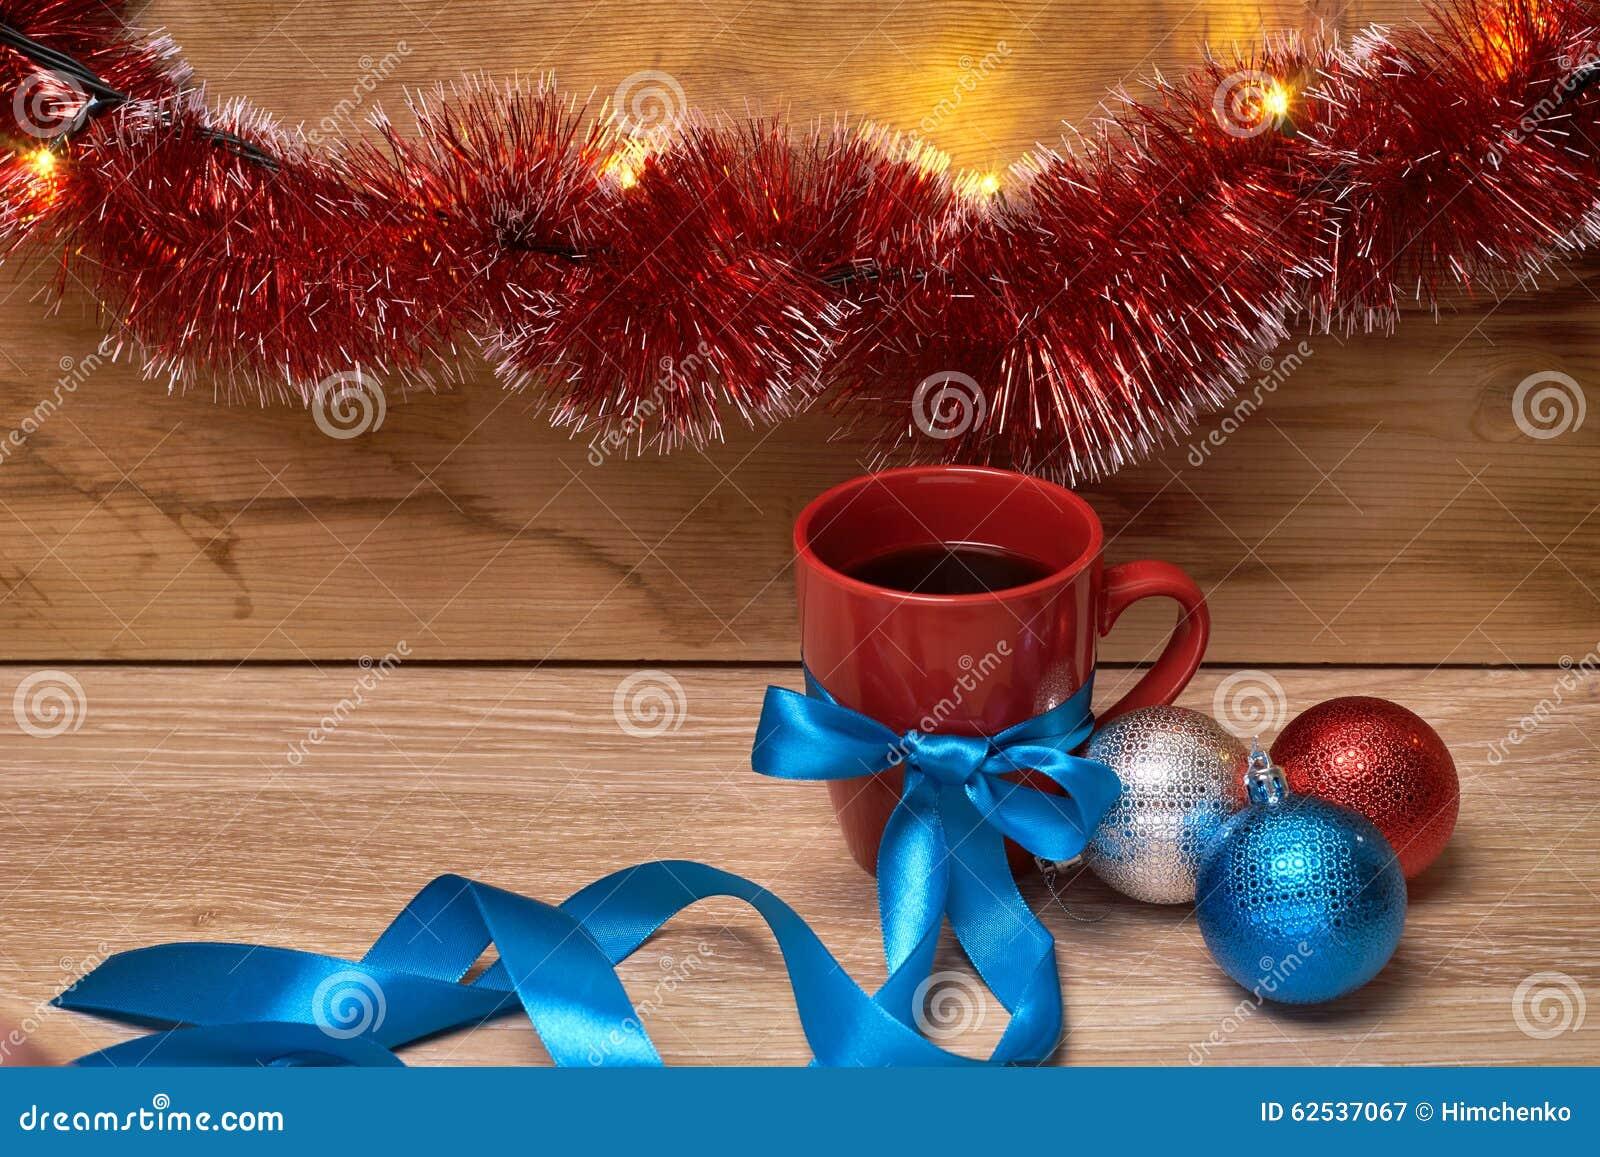 一杯咖啡在新年decorationsv的